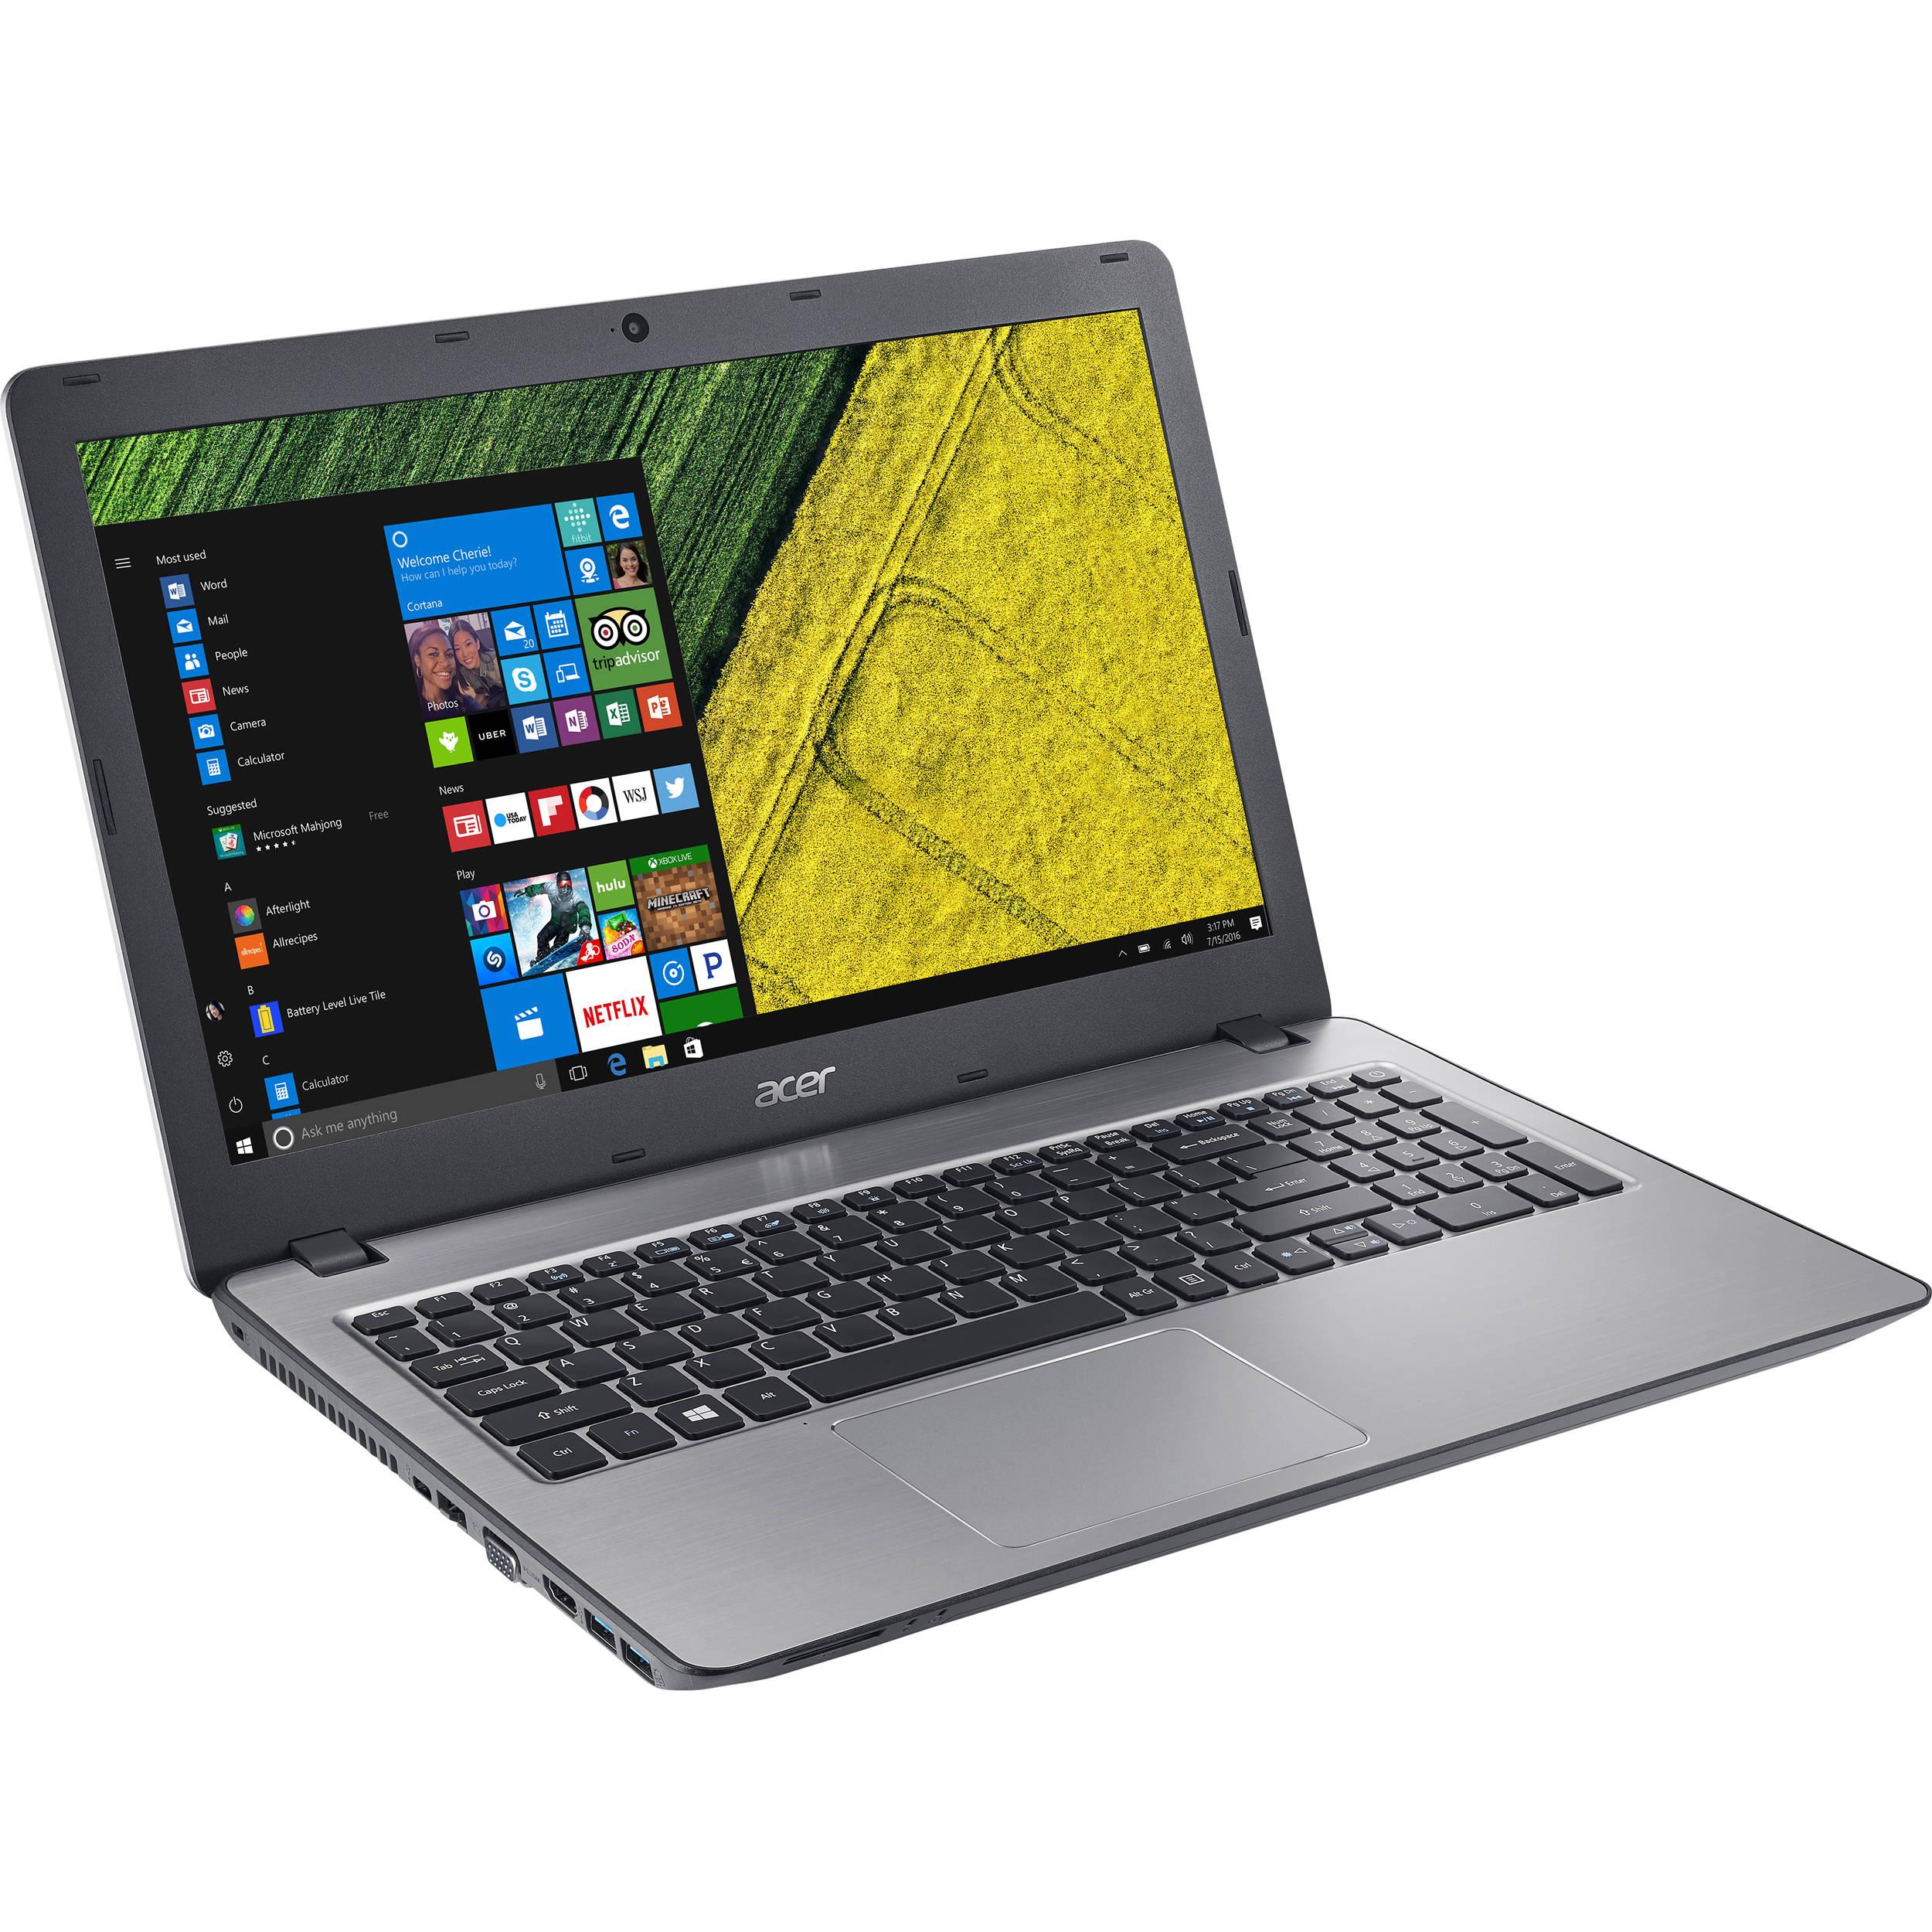 Acer Aspire F5-573 Intel WLAN Windows Vista 32-BIT